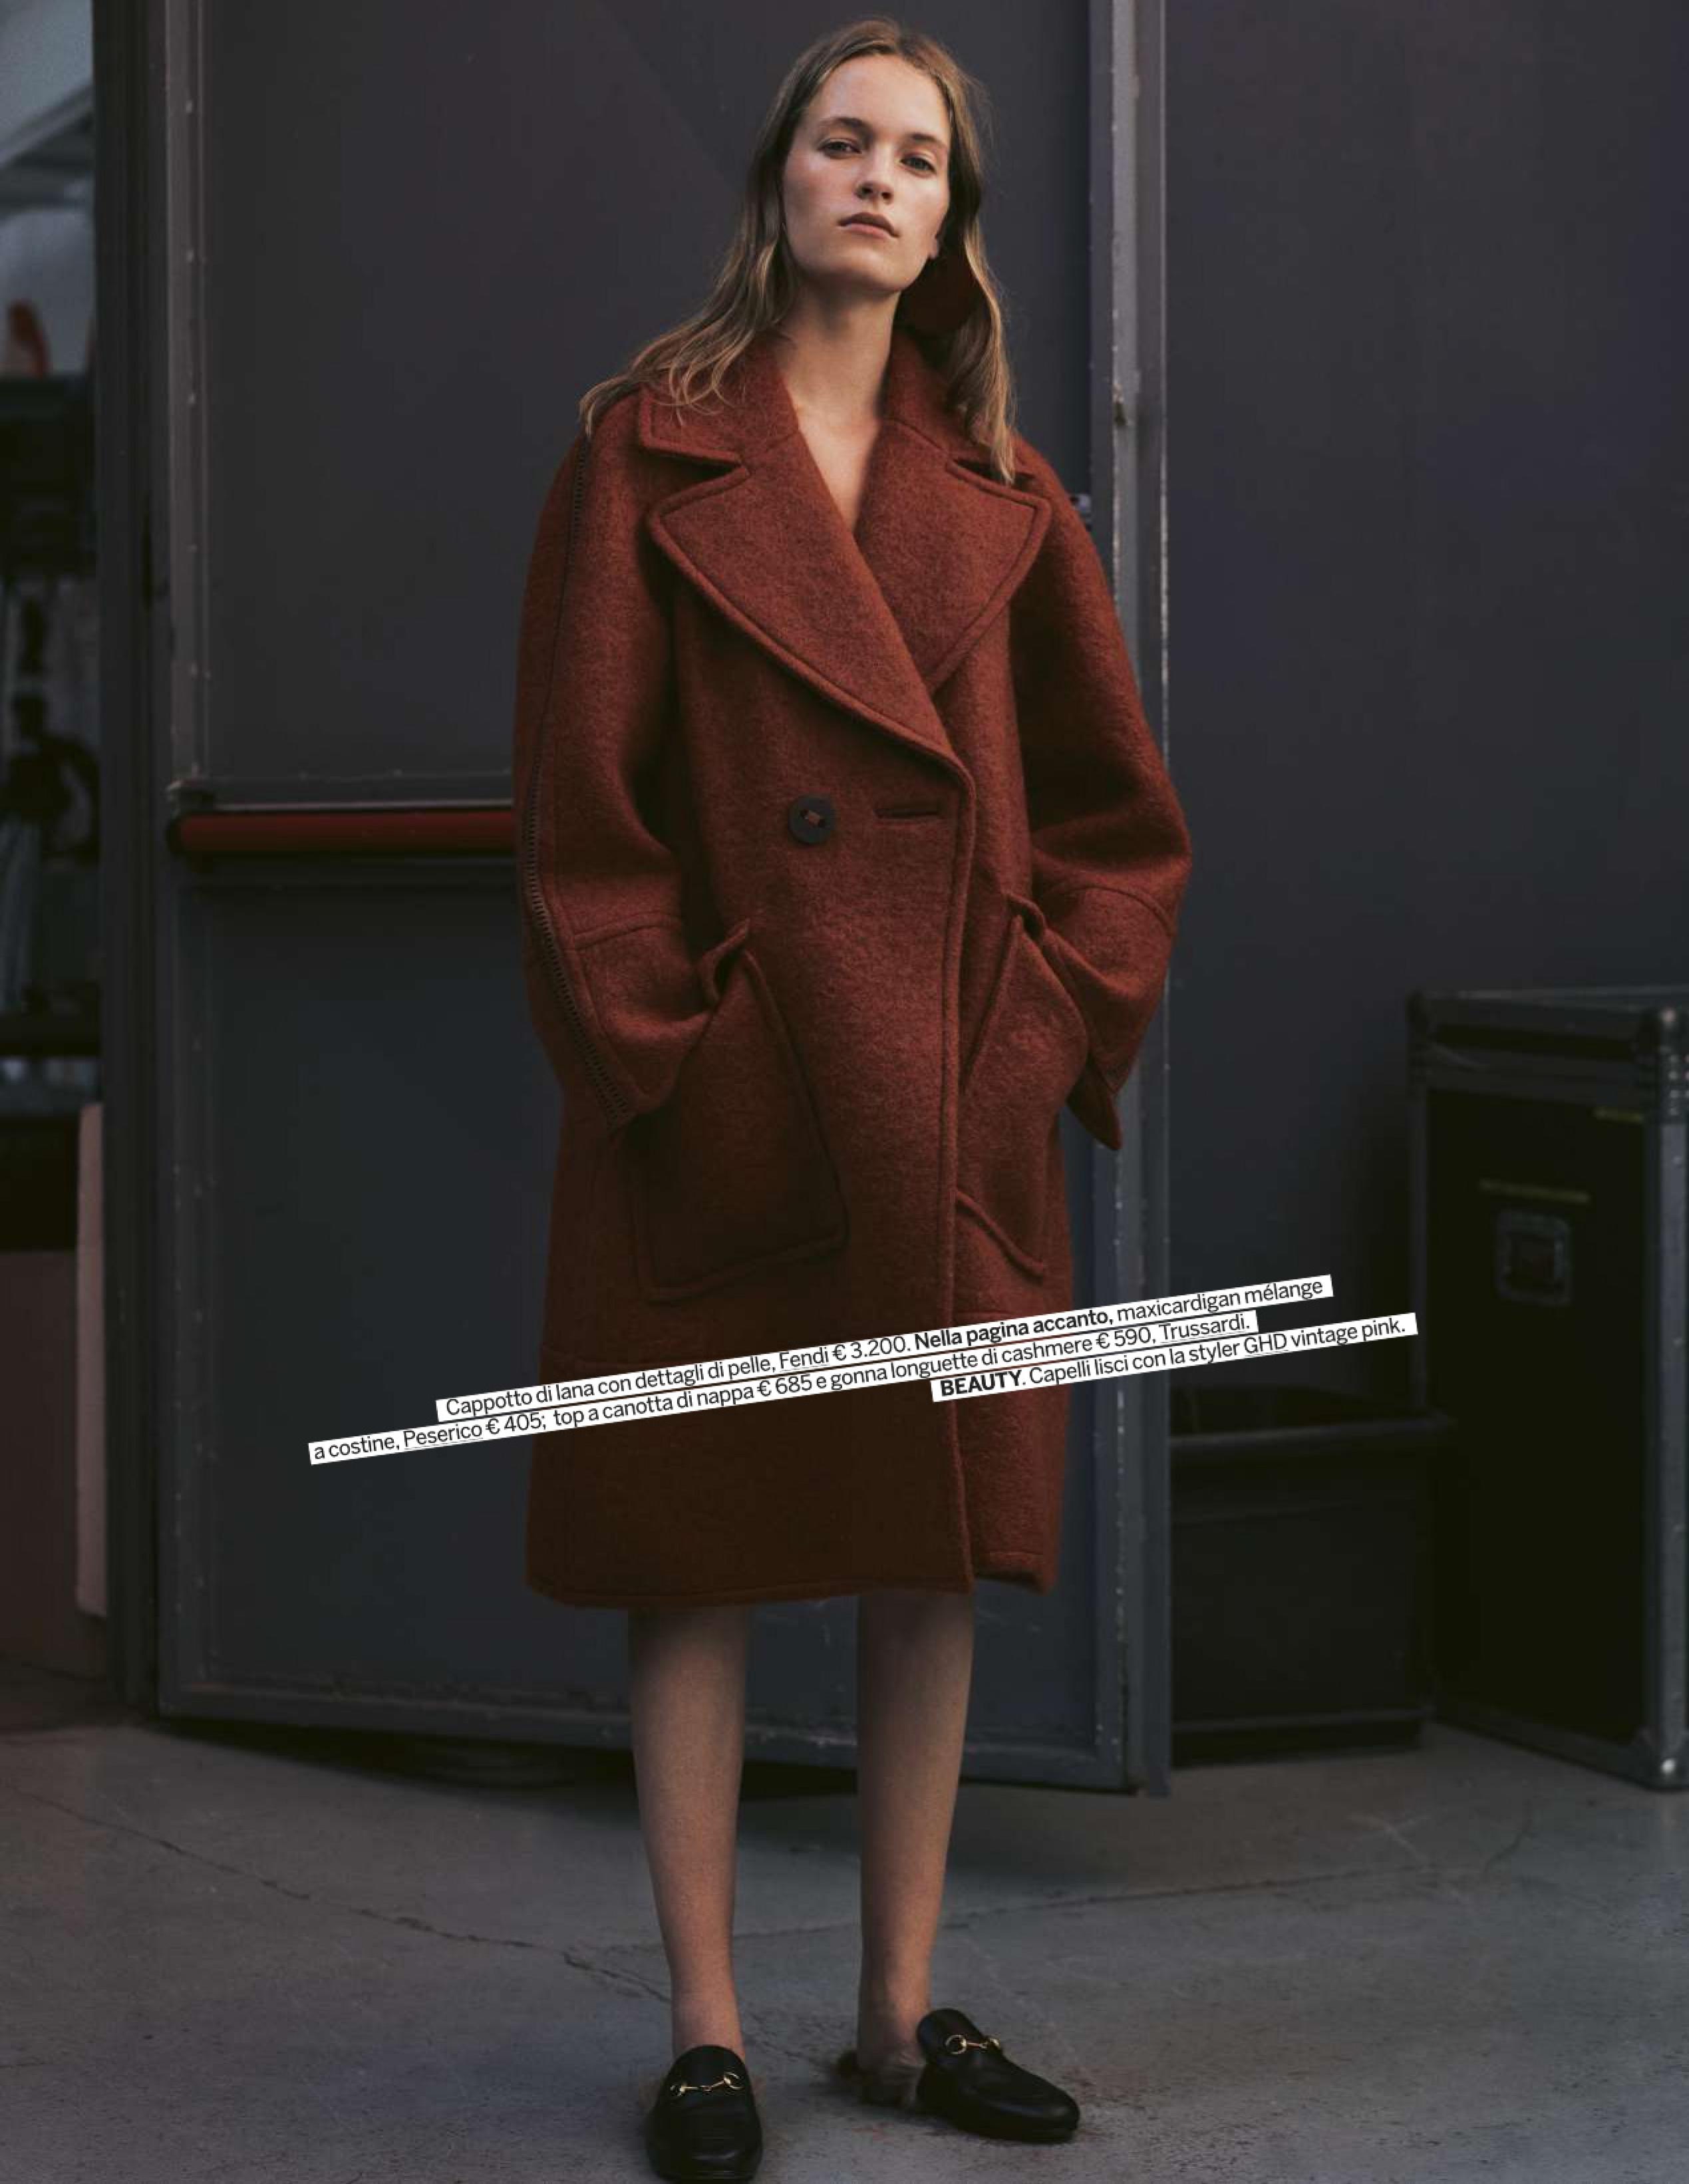 Esti Van Balen Gioia By Laurence Ellis And Monica Curreti 1 The Top Pink Model